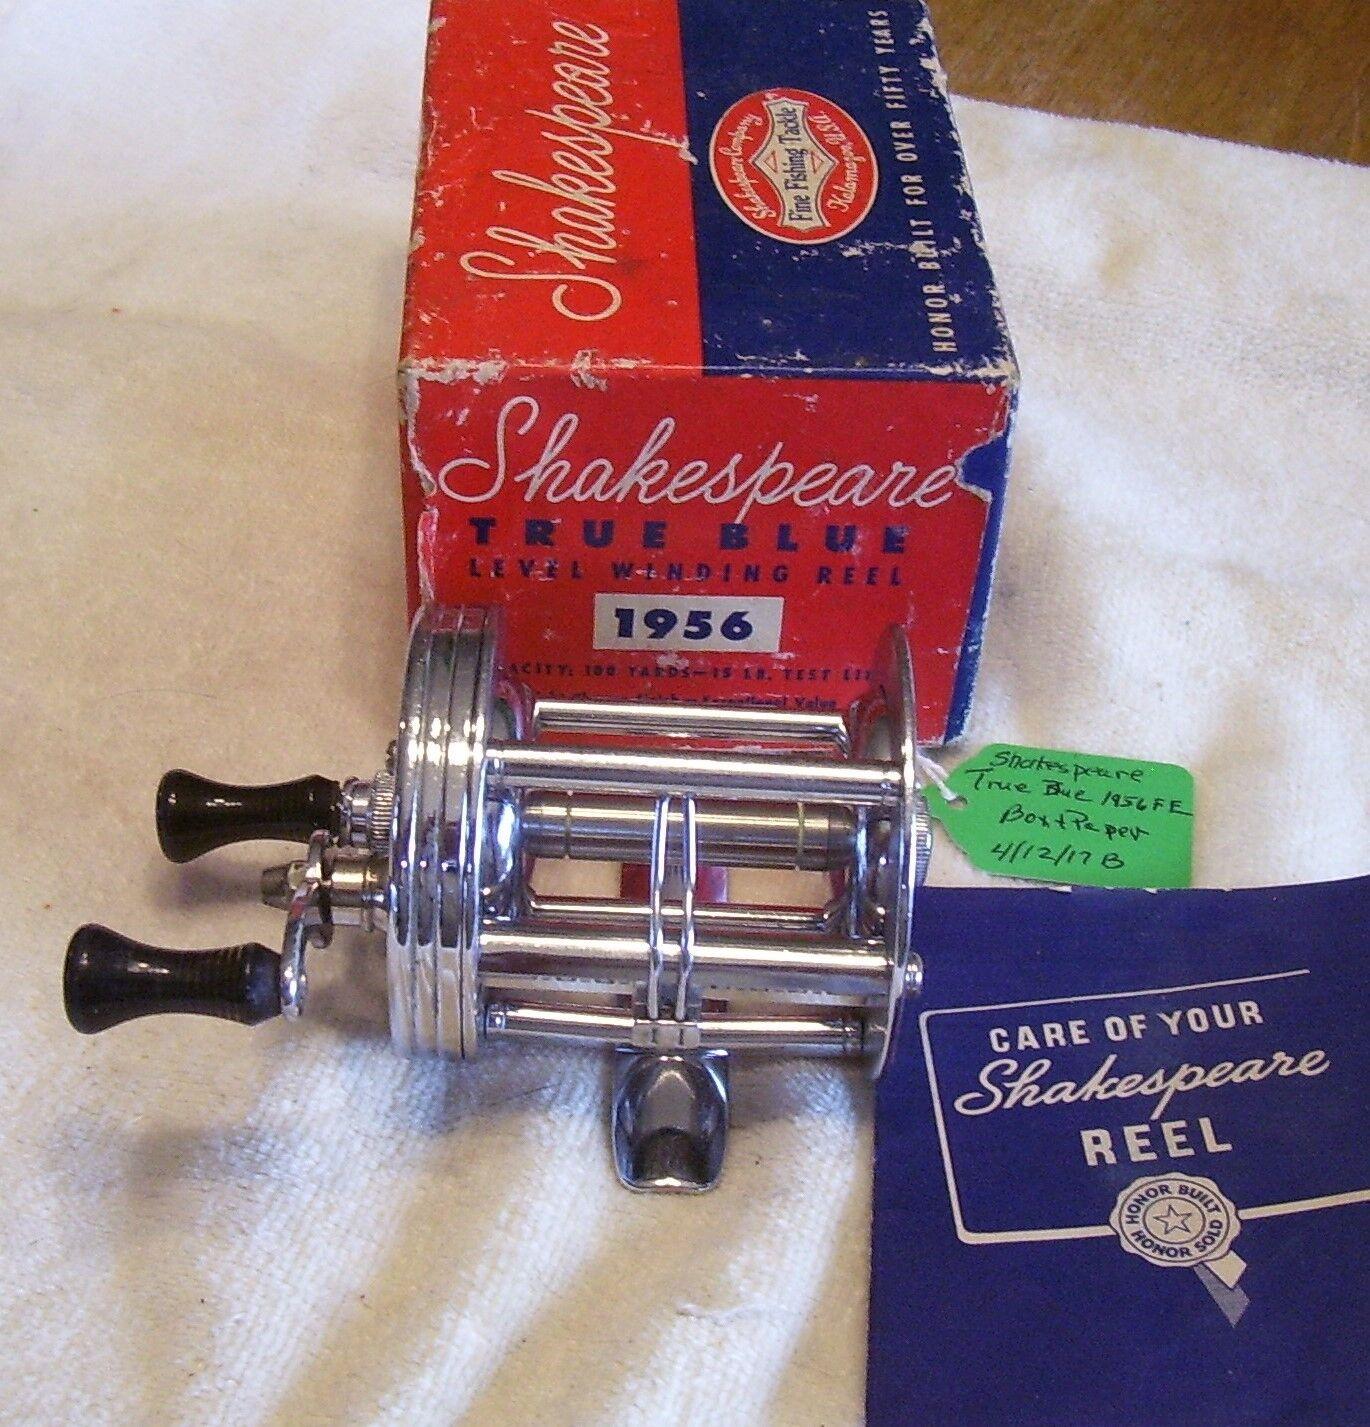 SHAKESPEARE TRUE blueeE 1956 FE  REEL  04 12  17 MW  BOX PAPER  online retailers